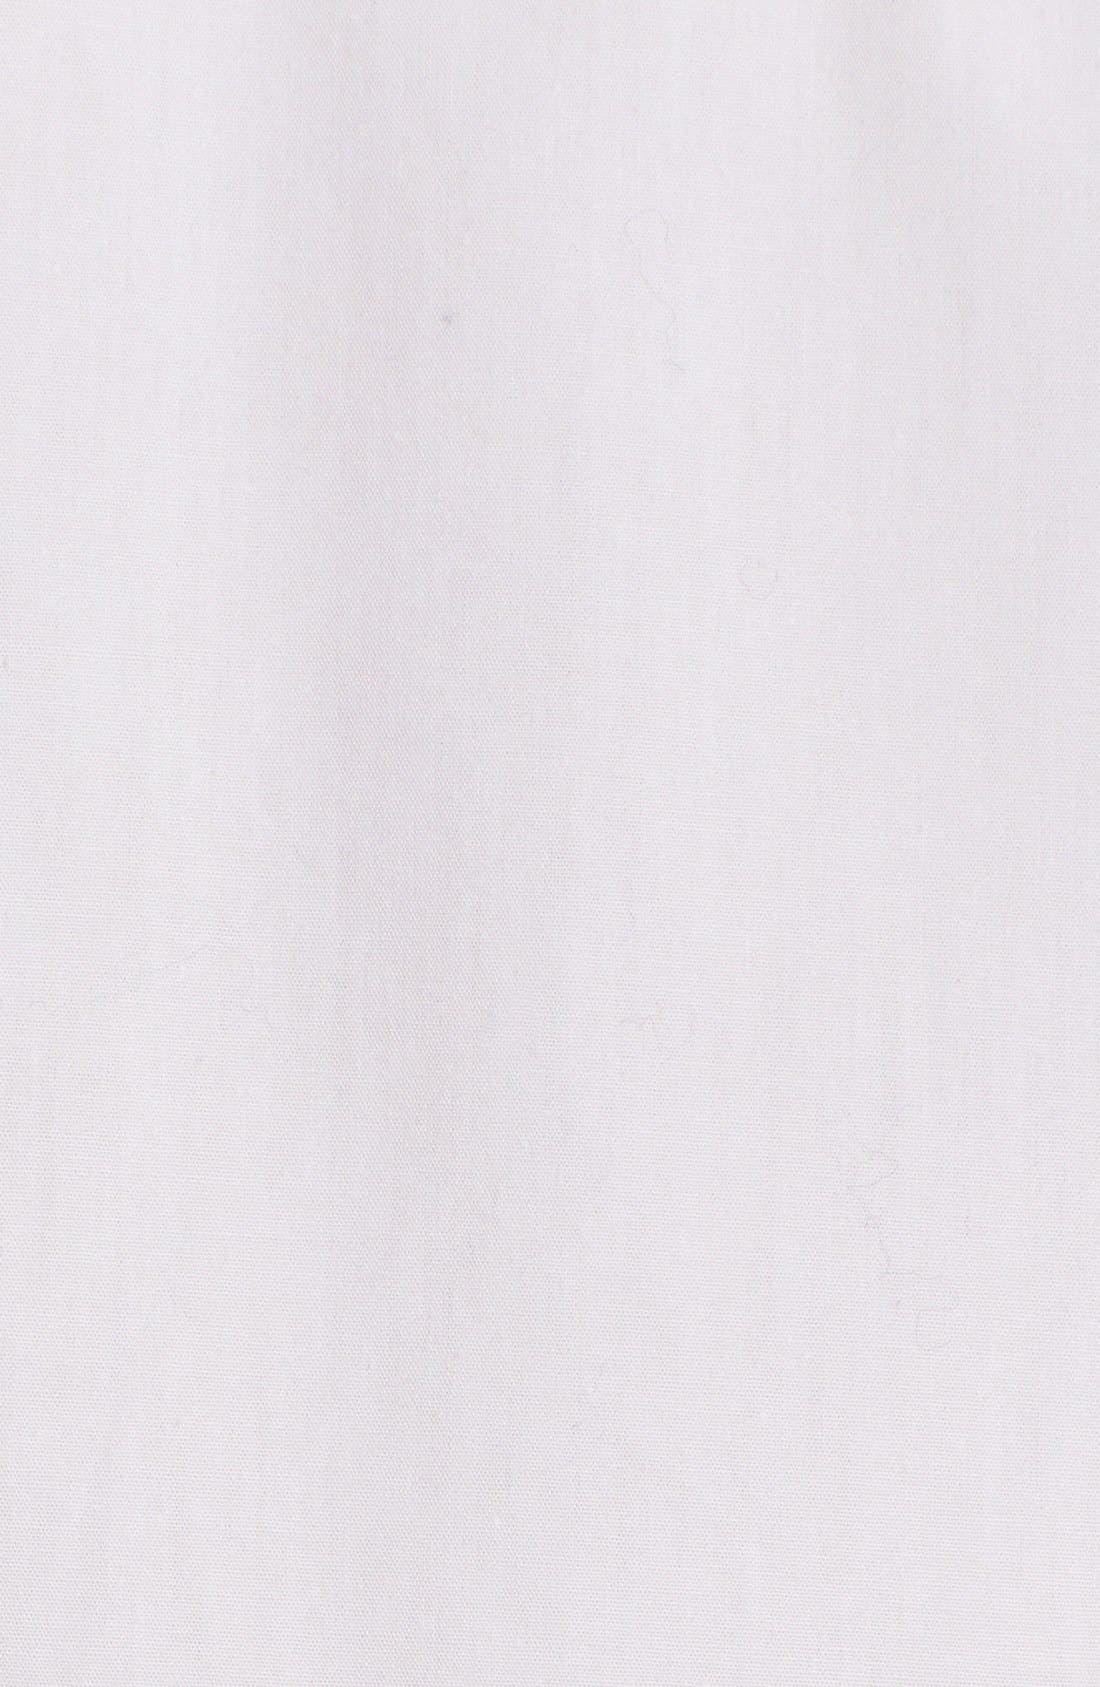 Truffaut Bell Sleeve Top,                             Alternate thumbnail 3, color,                             White